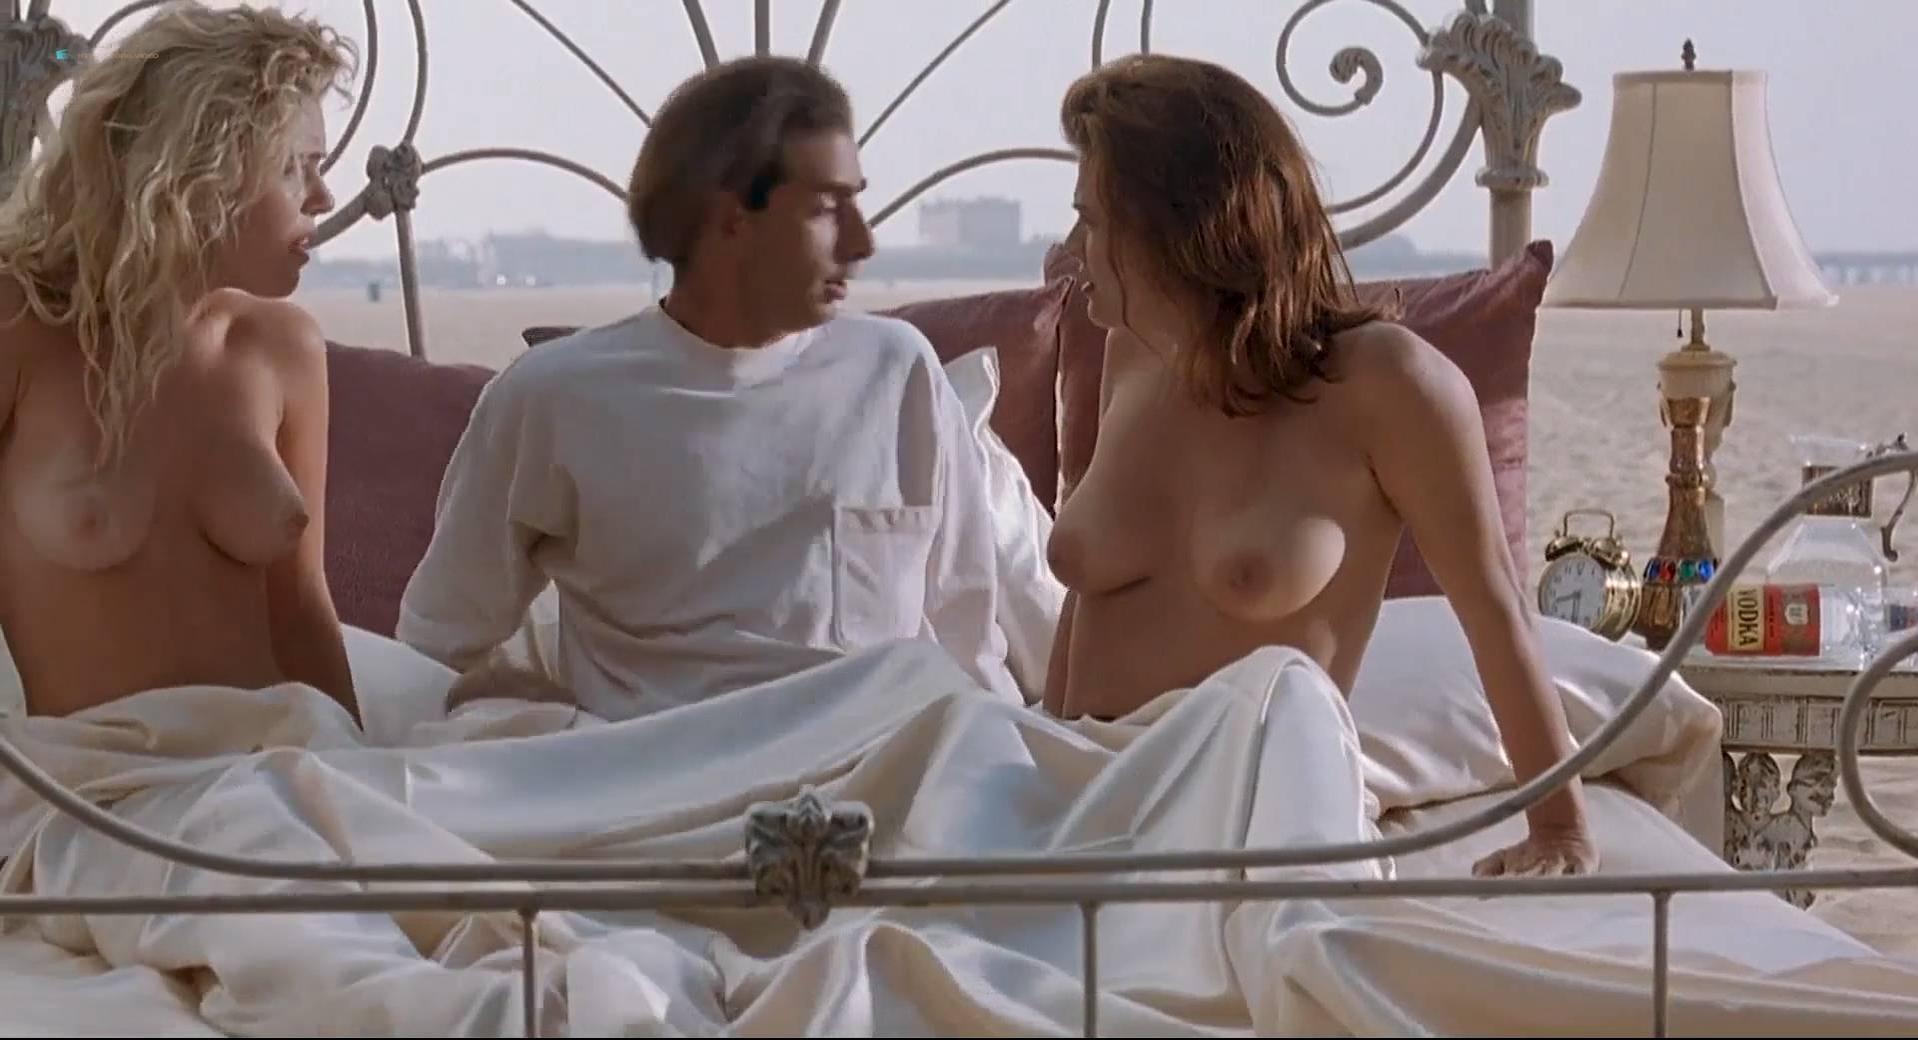 Monique Gabrielle nude, Michelle Grassnick nude, Alison Armitage nude, Wendy Kaye nude, Felicity Waterman nude - Miracle Beach (1992)